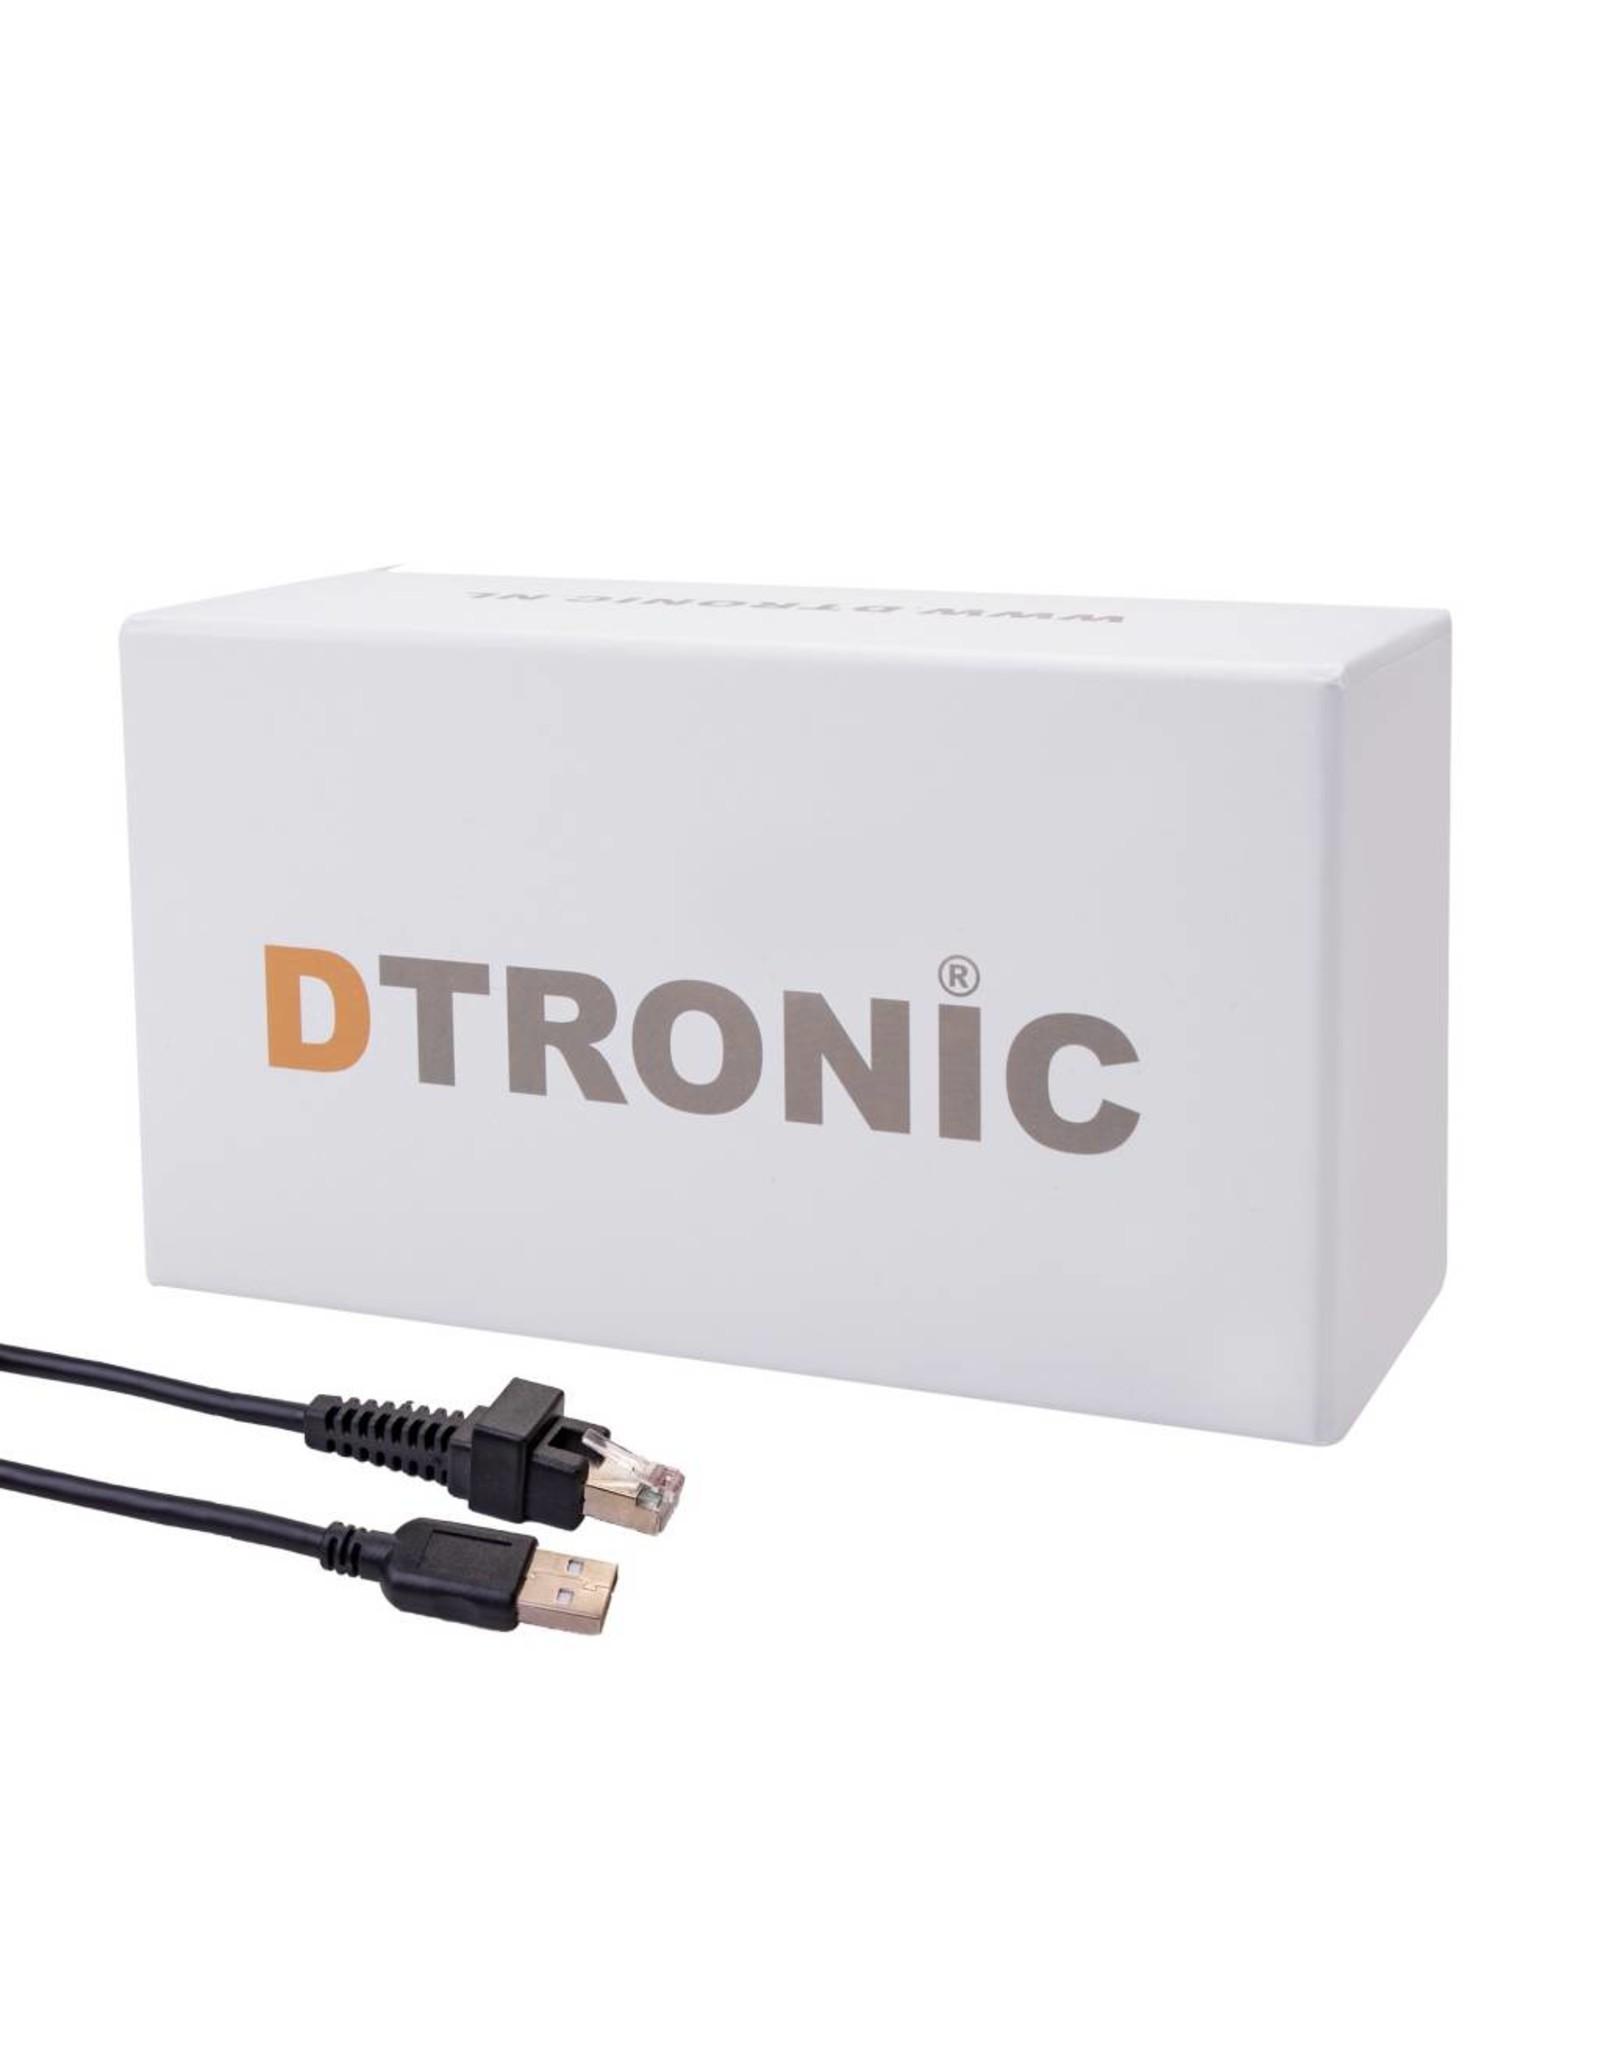 DTRONIC DTRONIC - USB 1